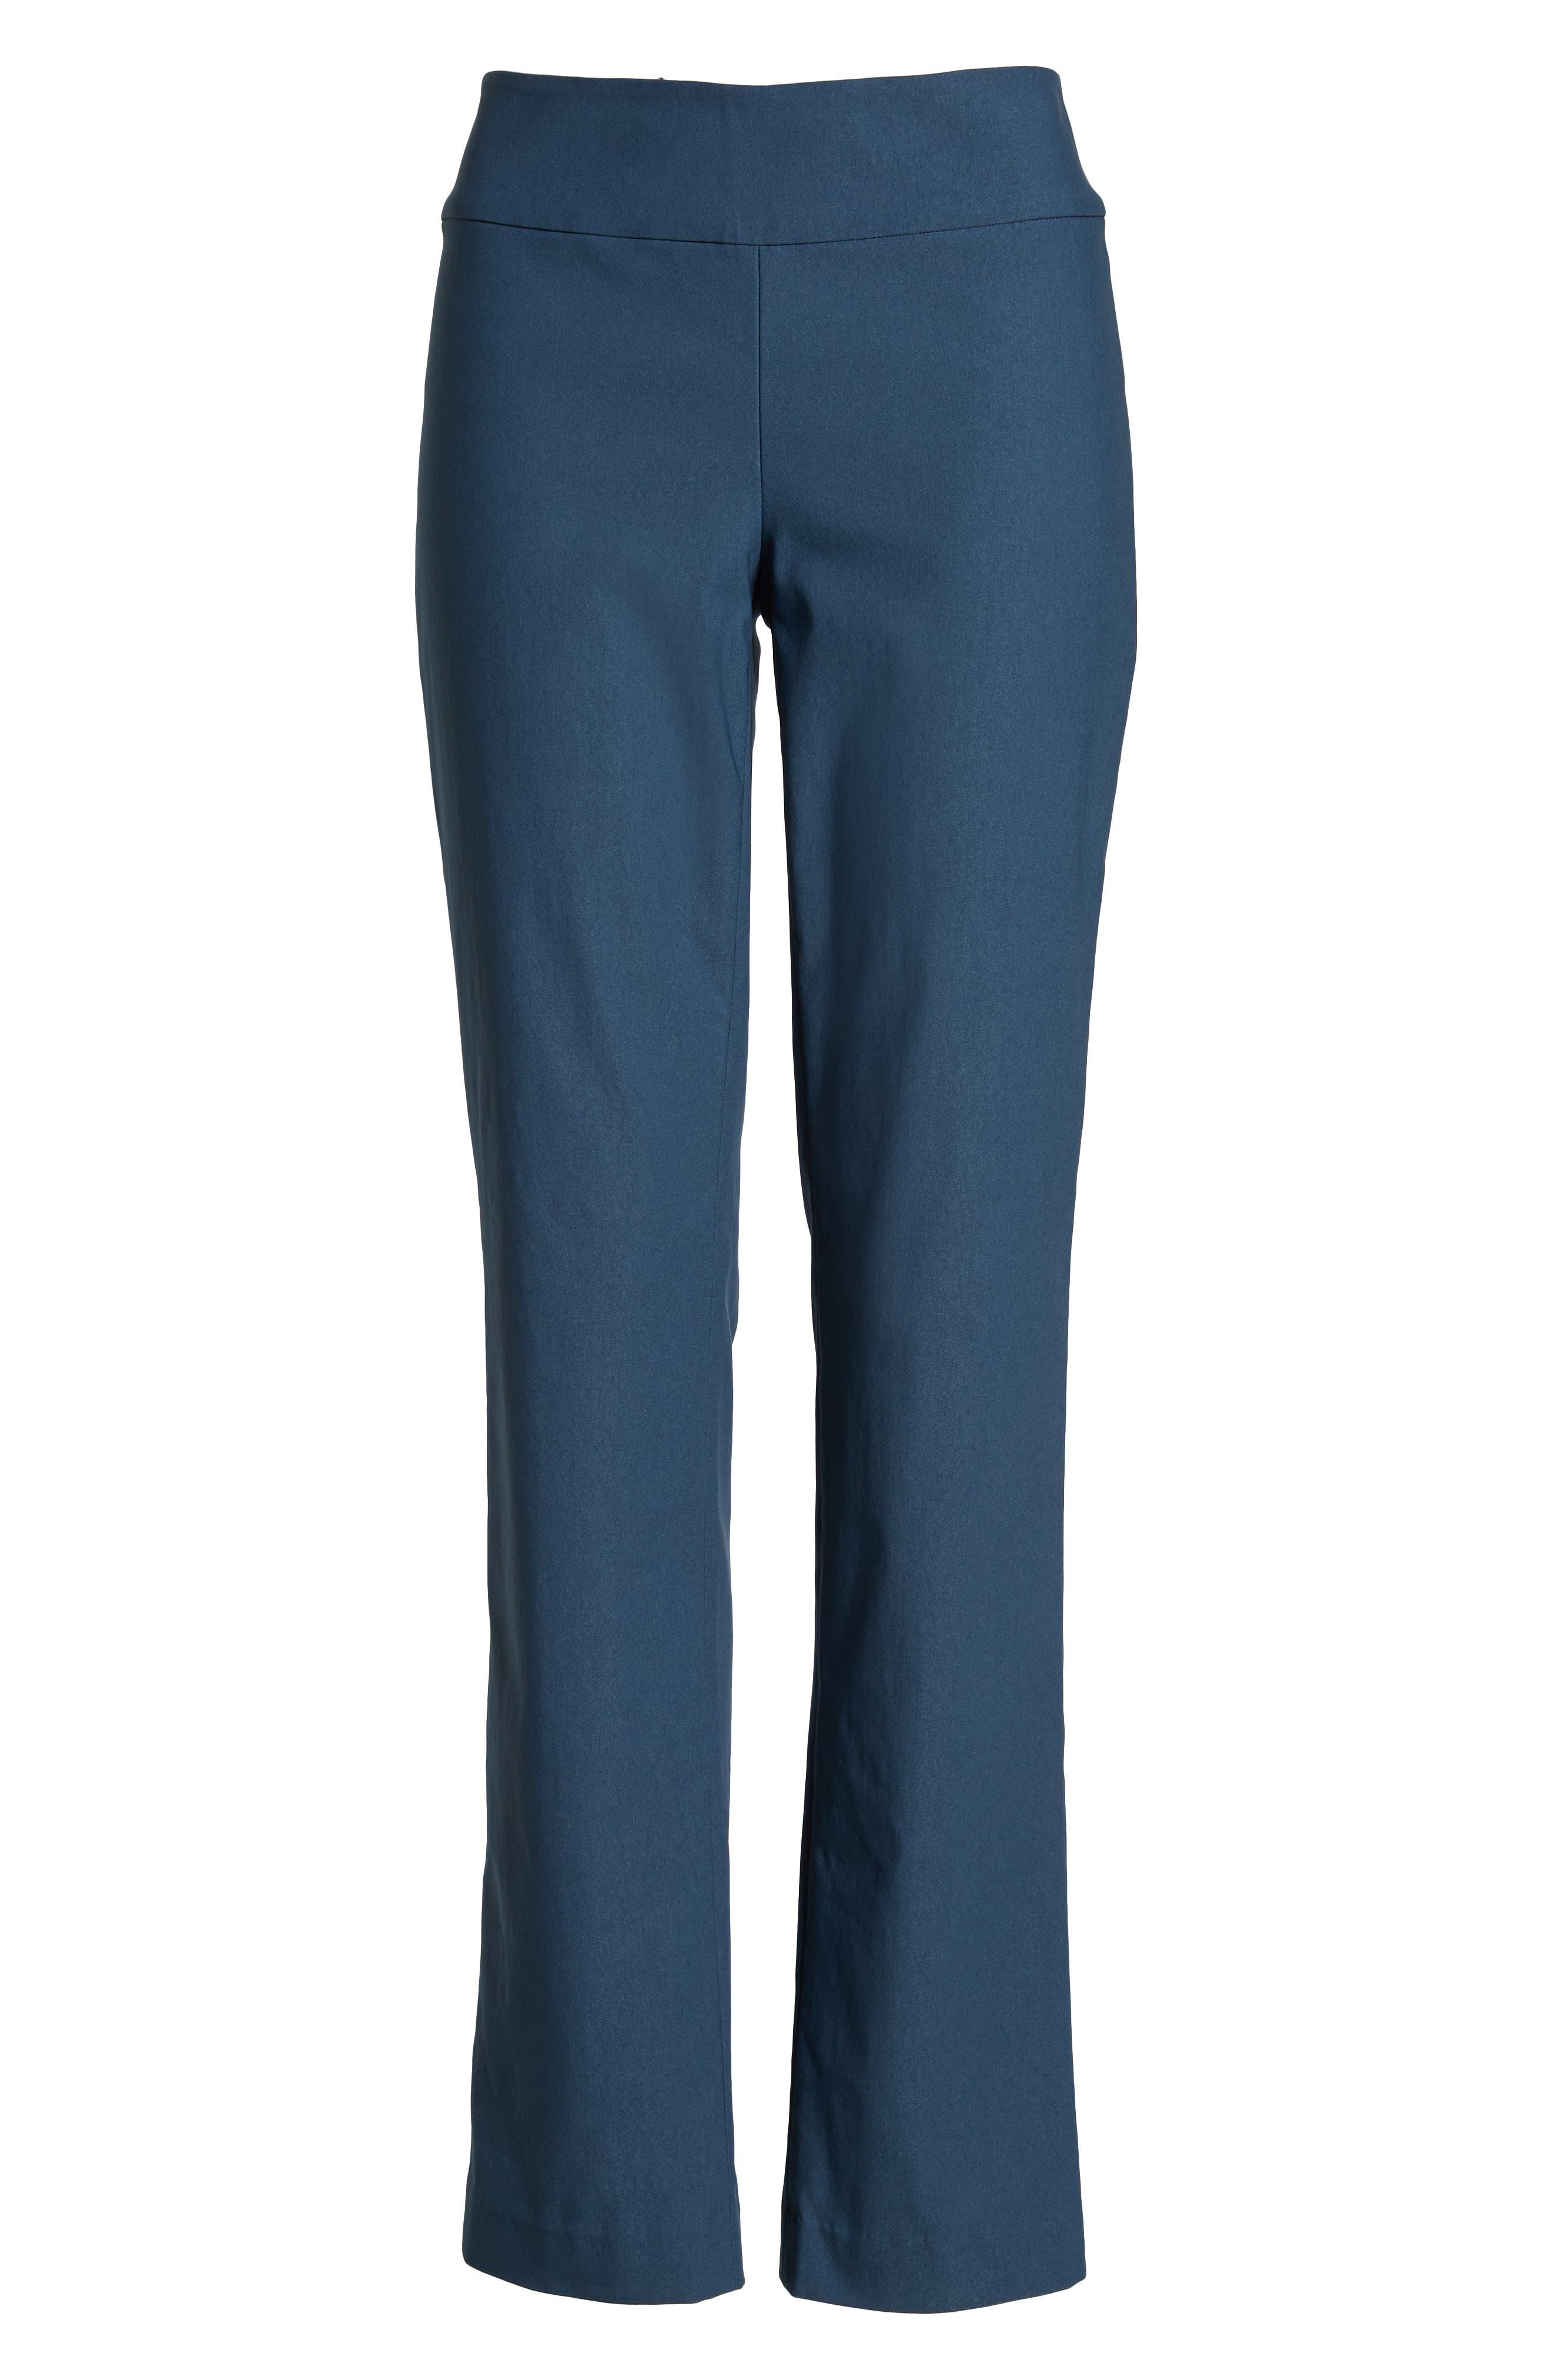 NIC+ZOE, Wonderstretch Straight Leg Pants, Alternate thumbnail 7, color, INDIGO SEA